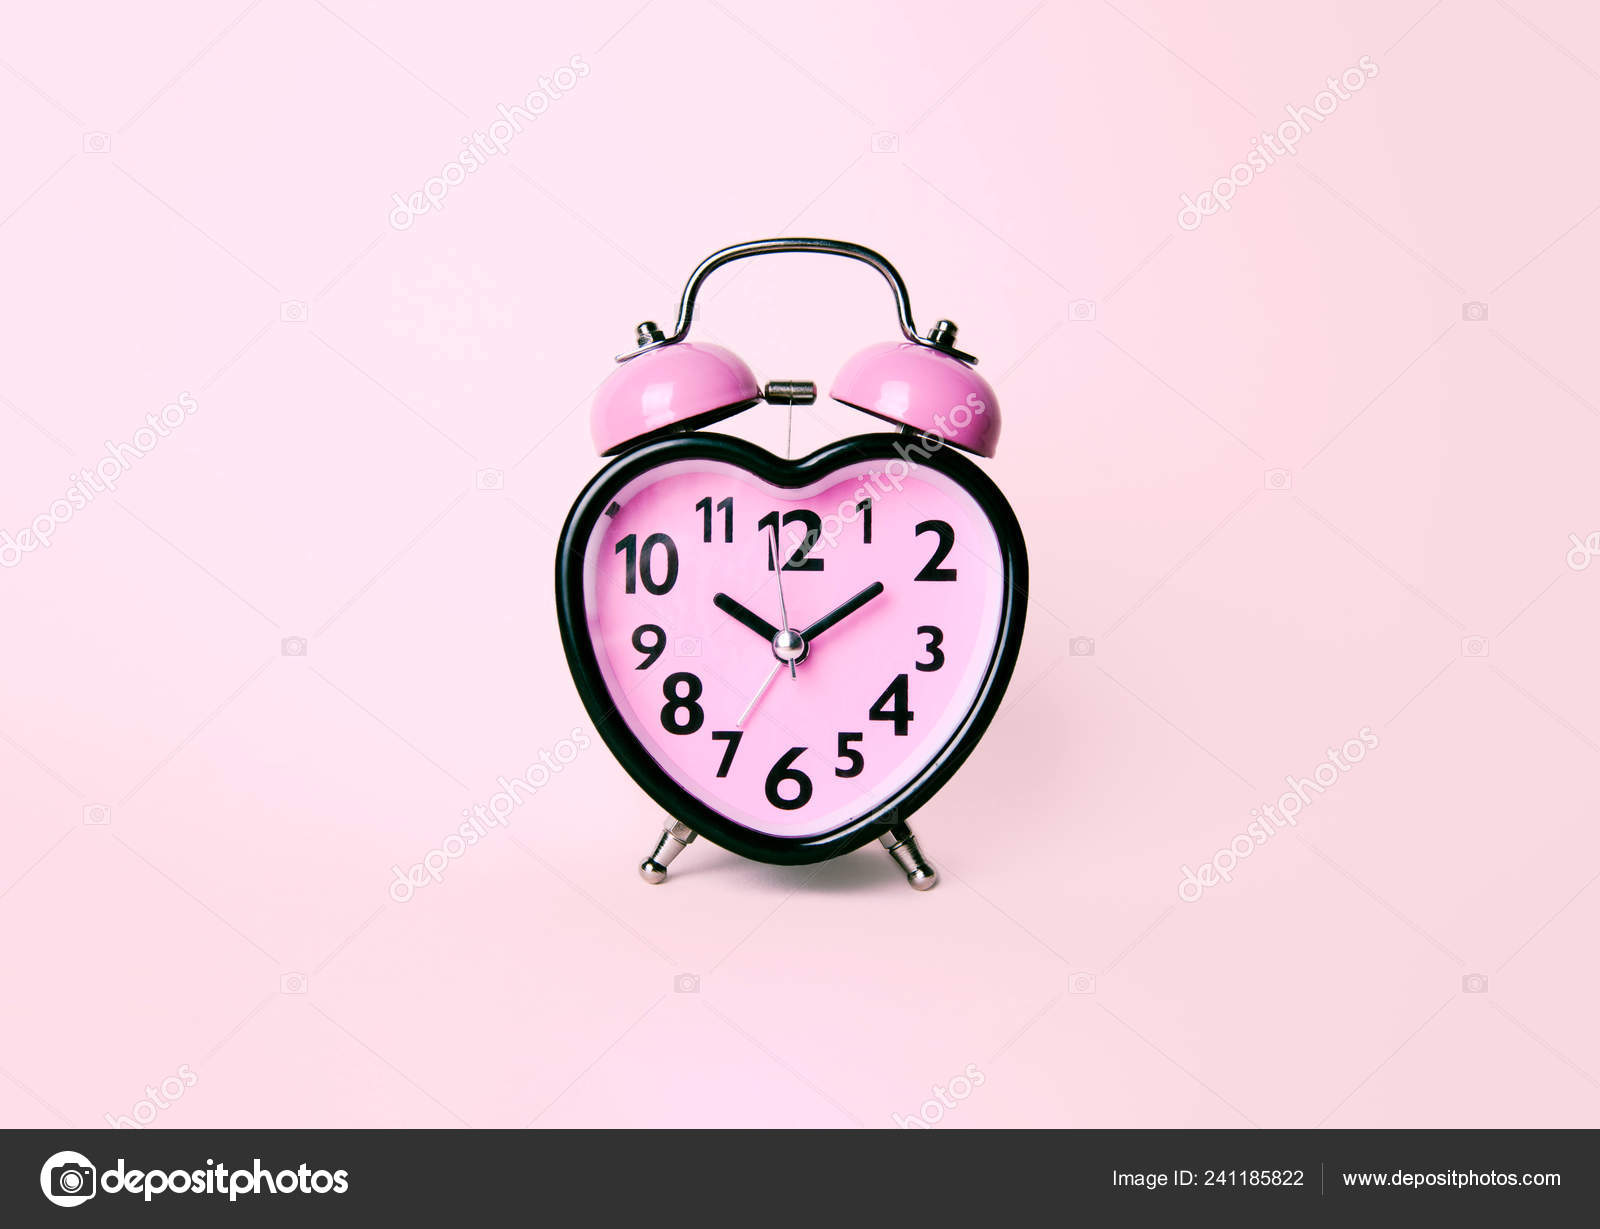 heart shaped clock on